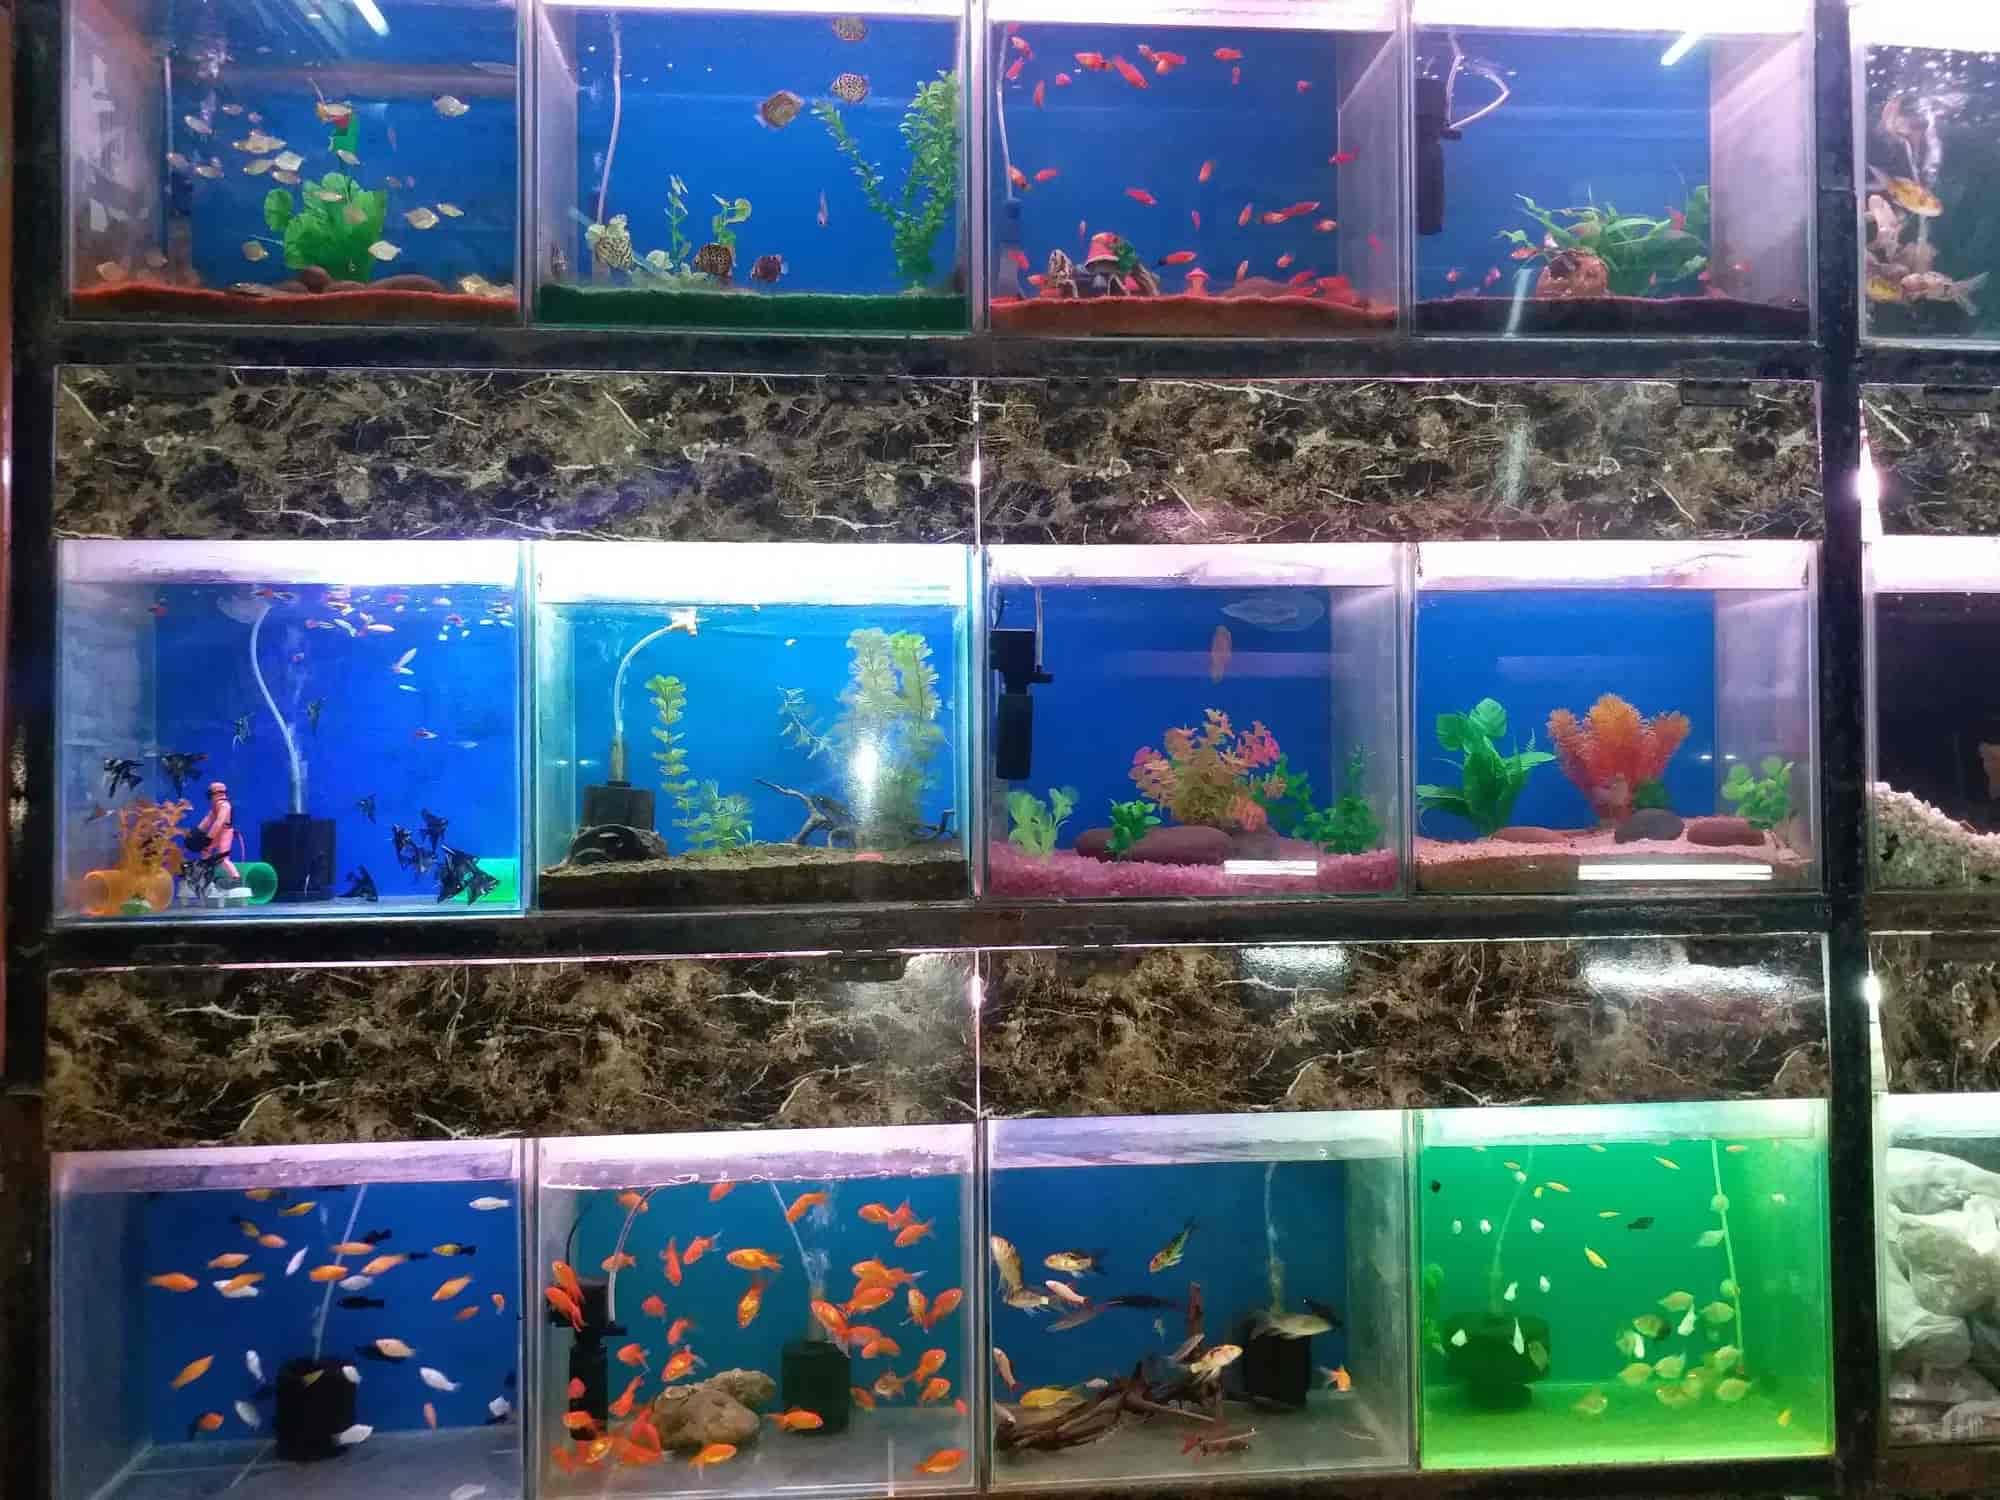 Hami Fish Aquarium Jogeshwari West Pet Shops In Mumbai Justdial